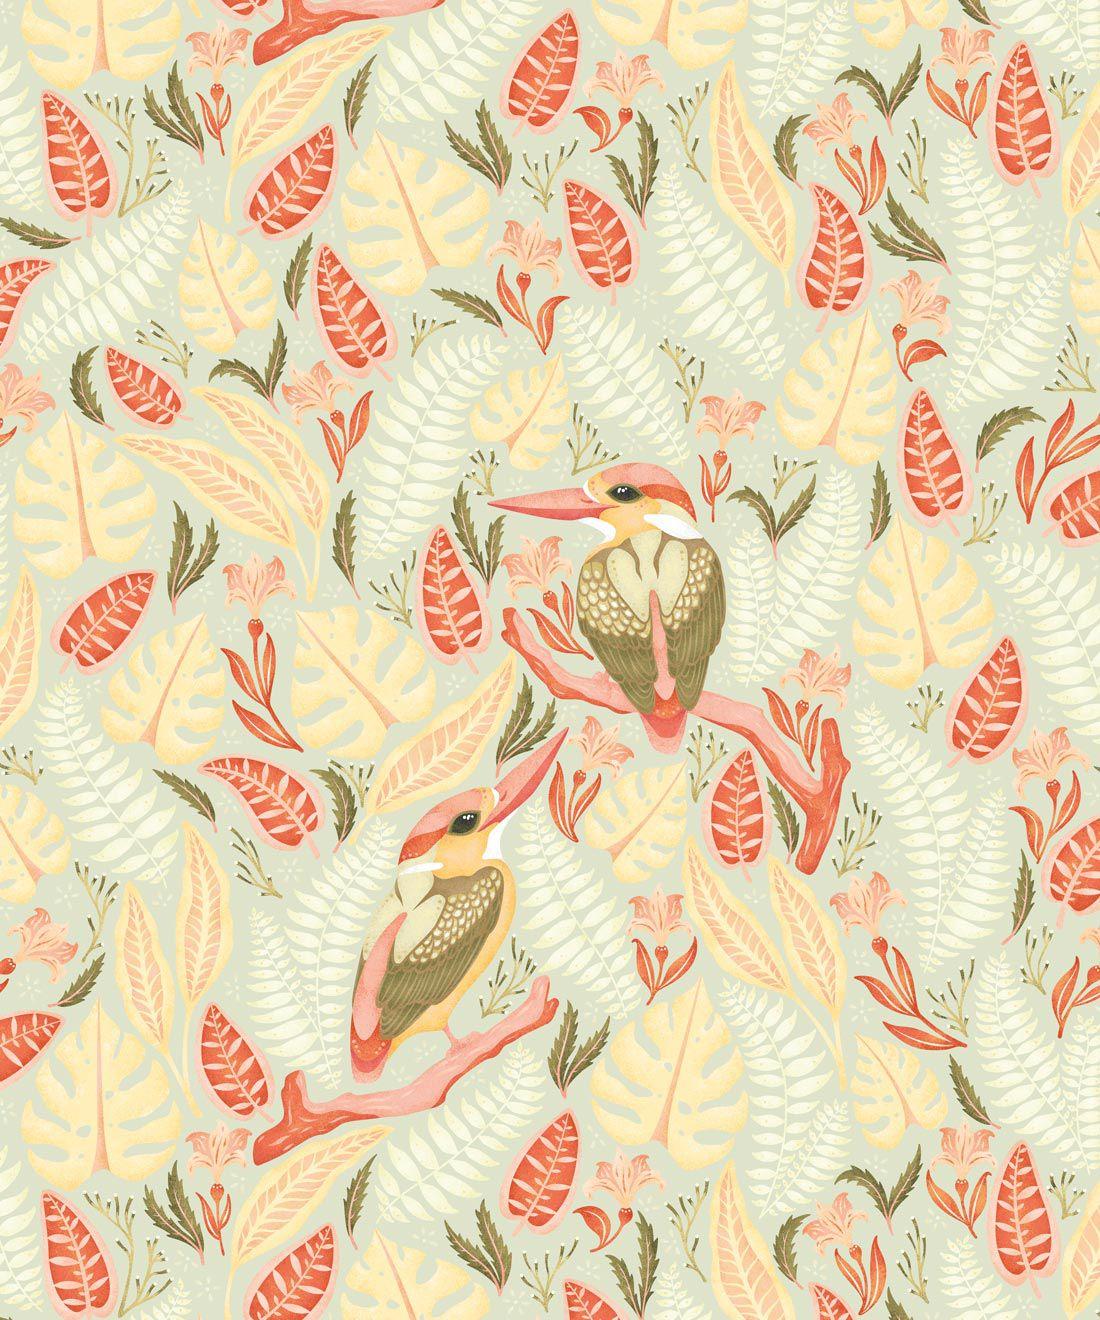 Kingfisher Wallpaper • Bird Wallpaper • Light Pastel Wallpaper